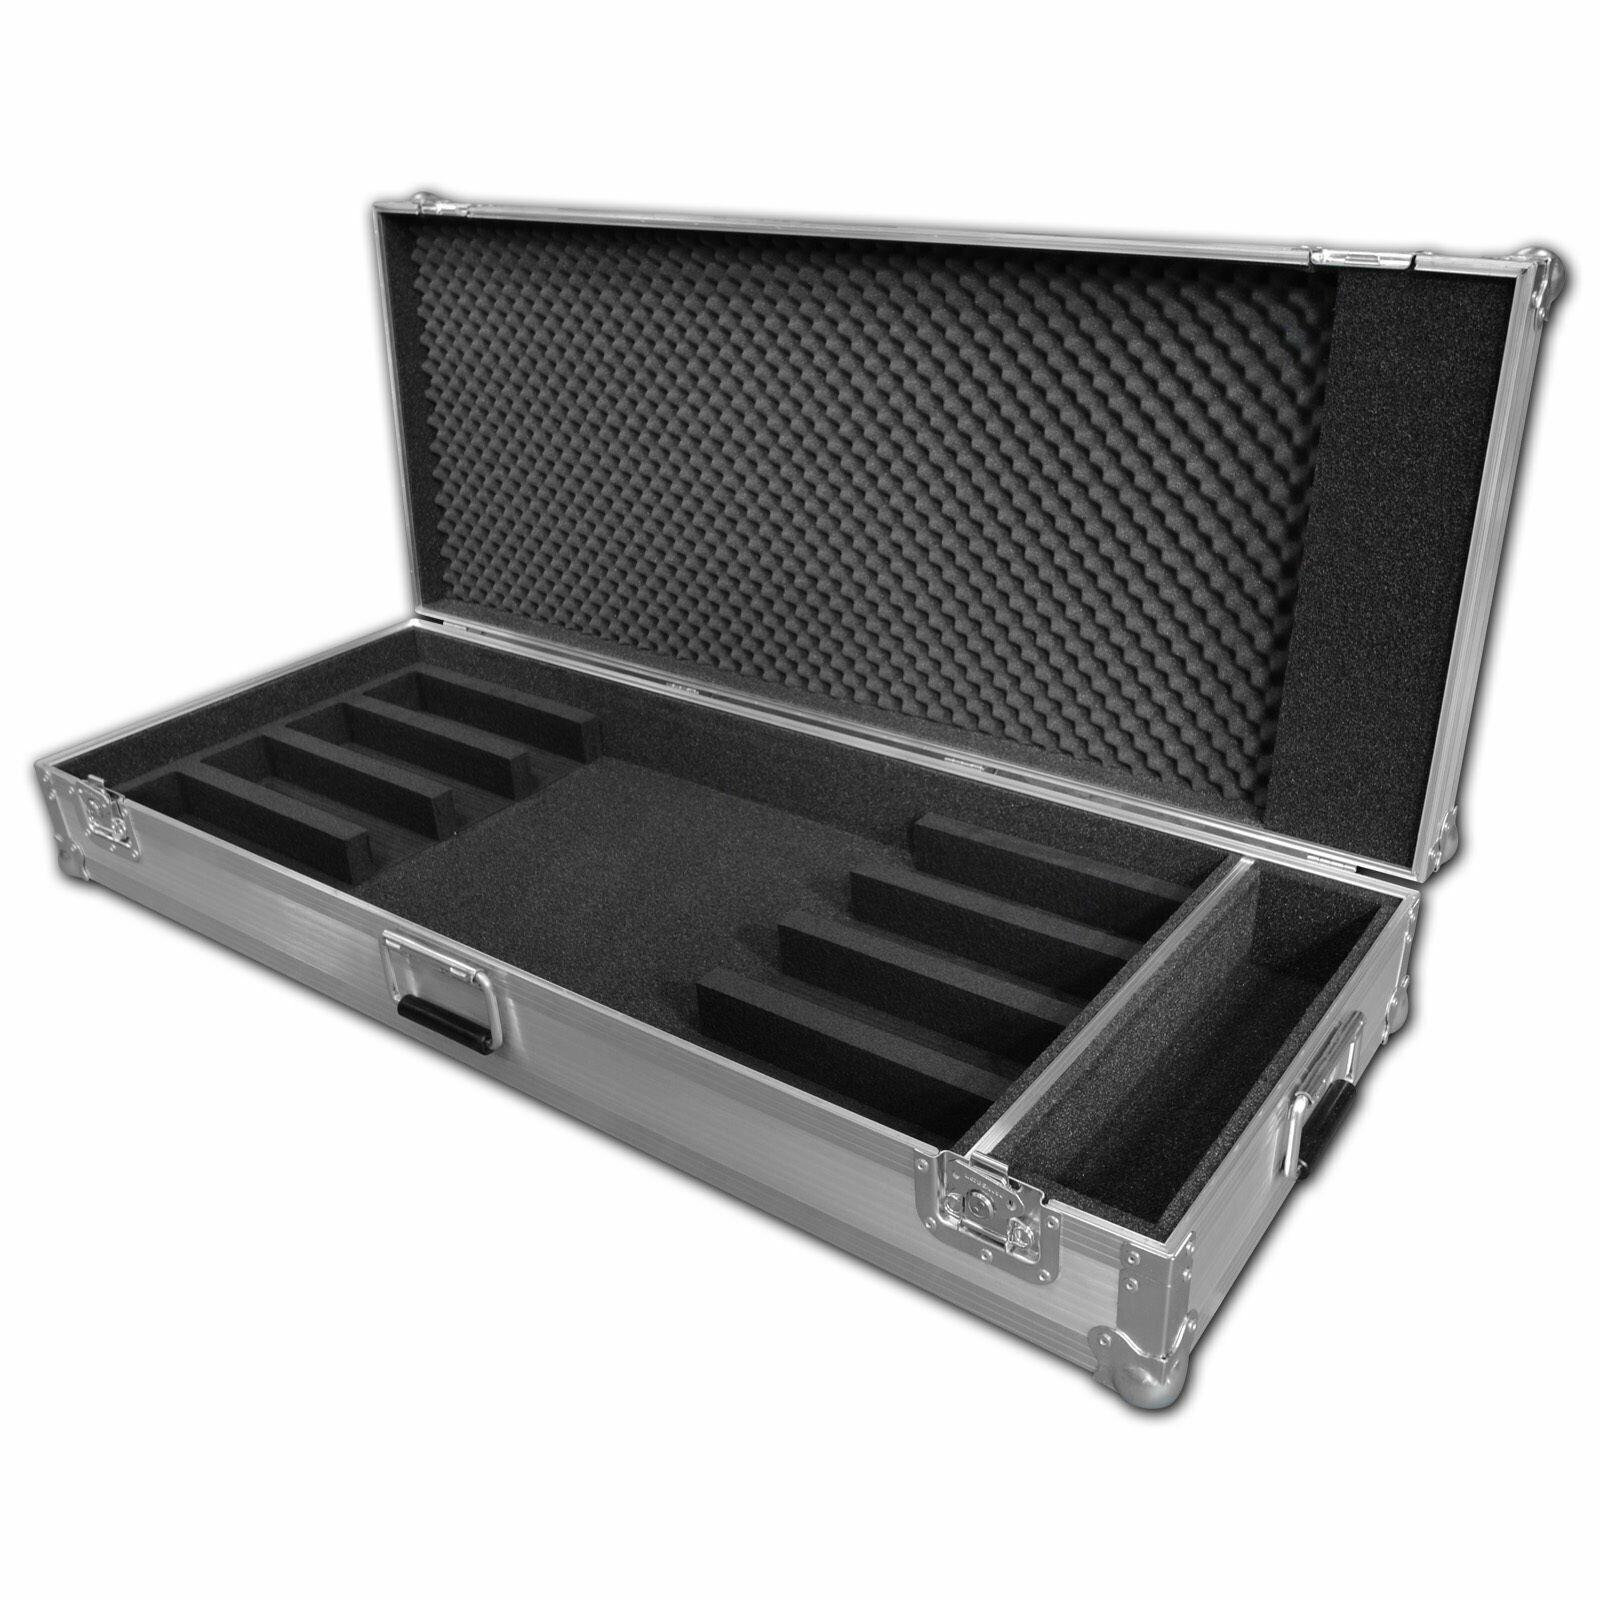 LED Batten Flight Case To fit 4 Battens for Chauvet Freedom Strip Mini RGBA